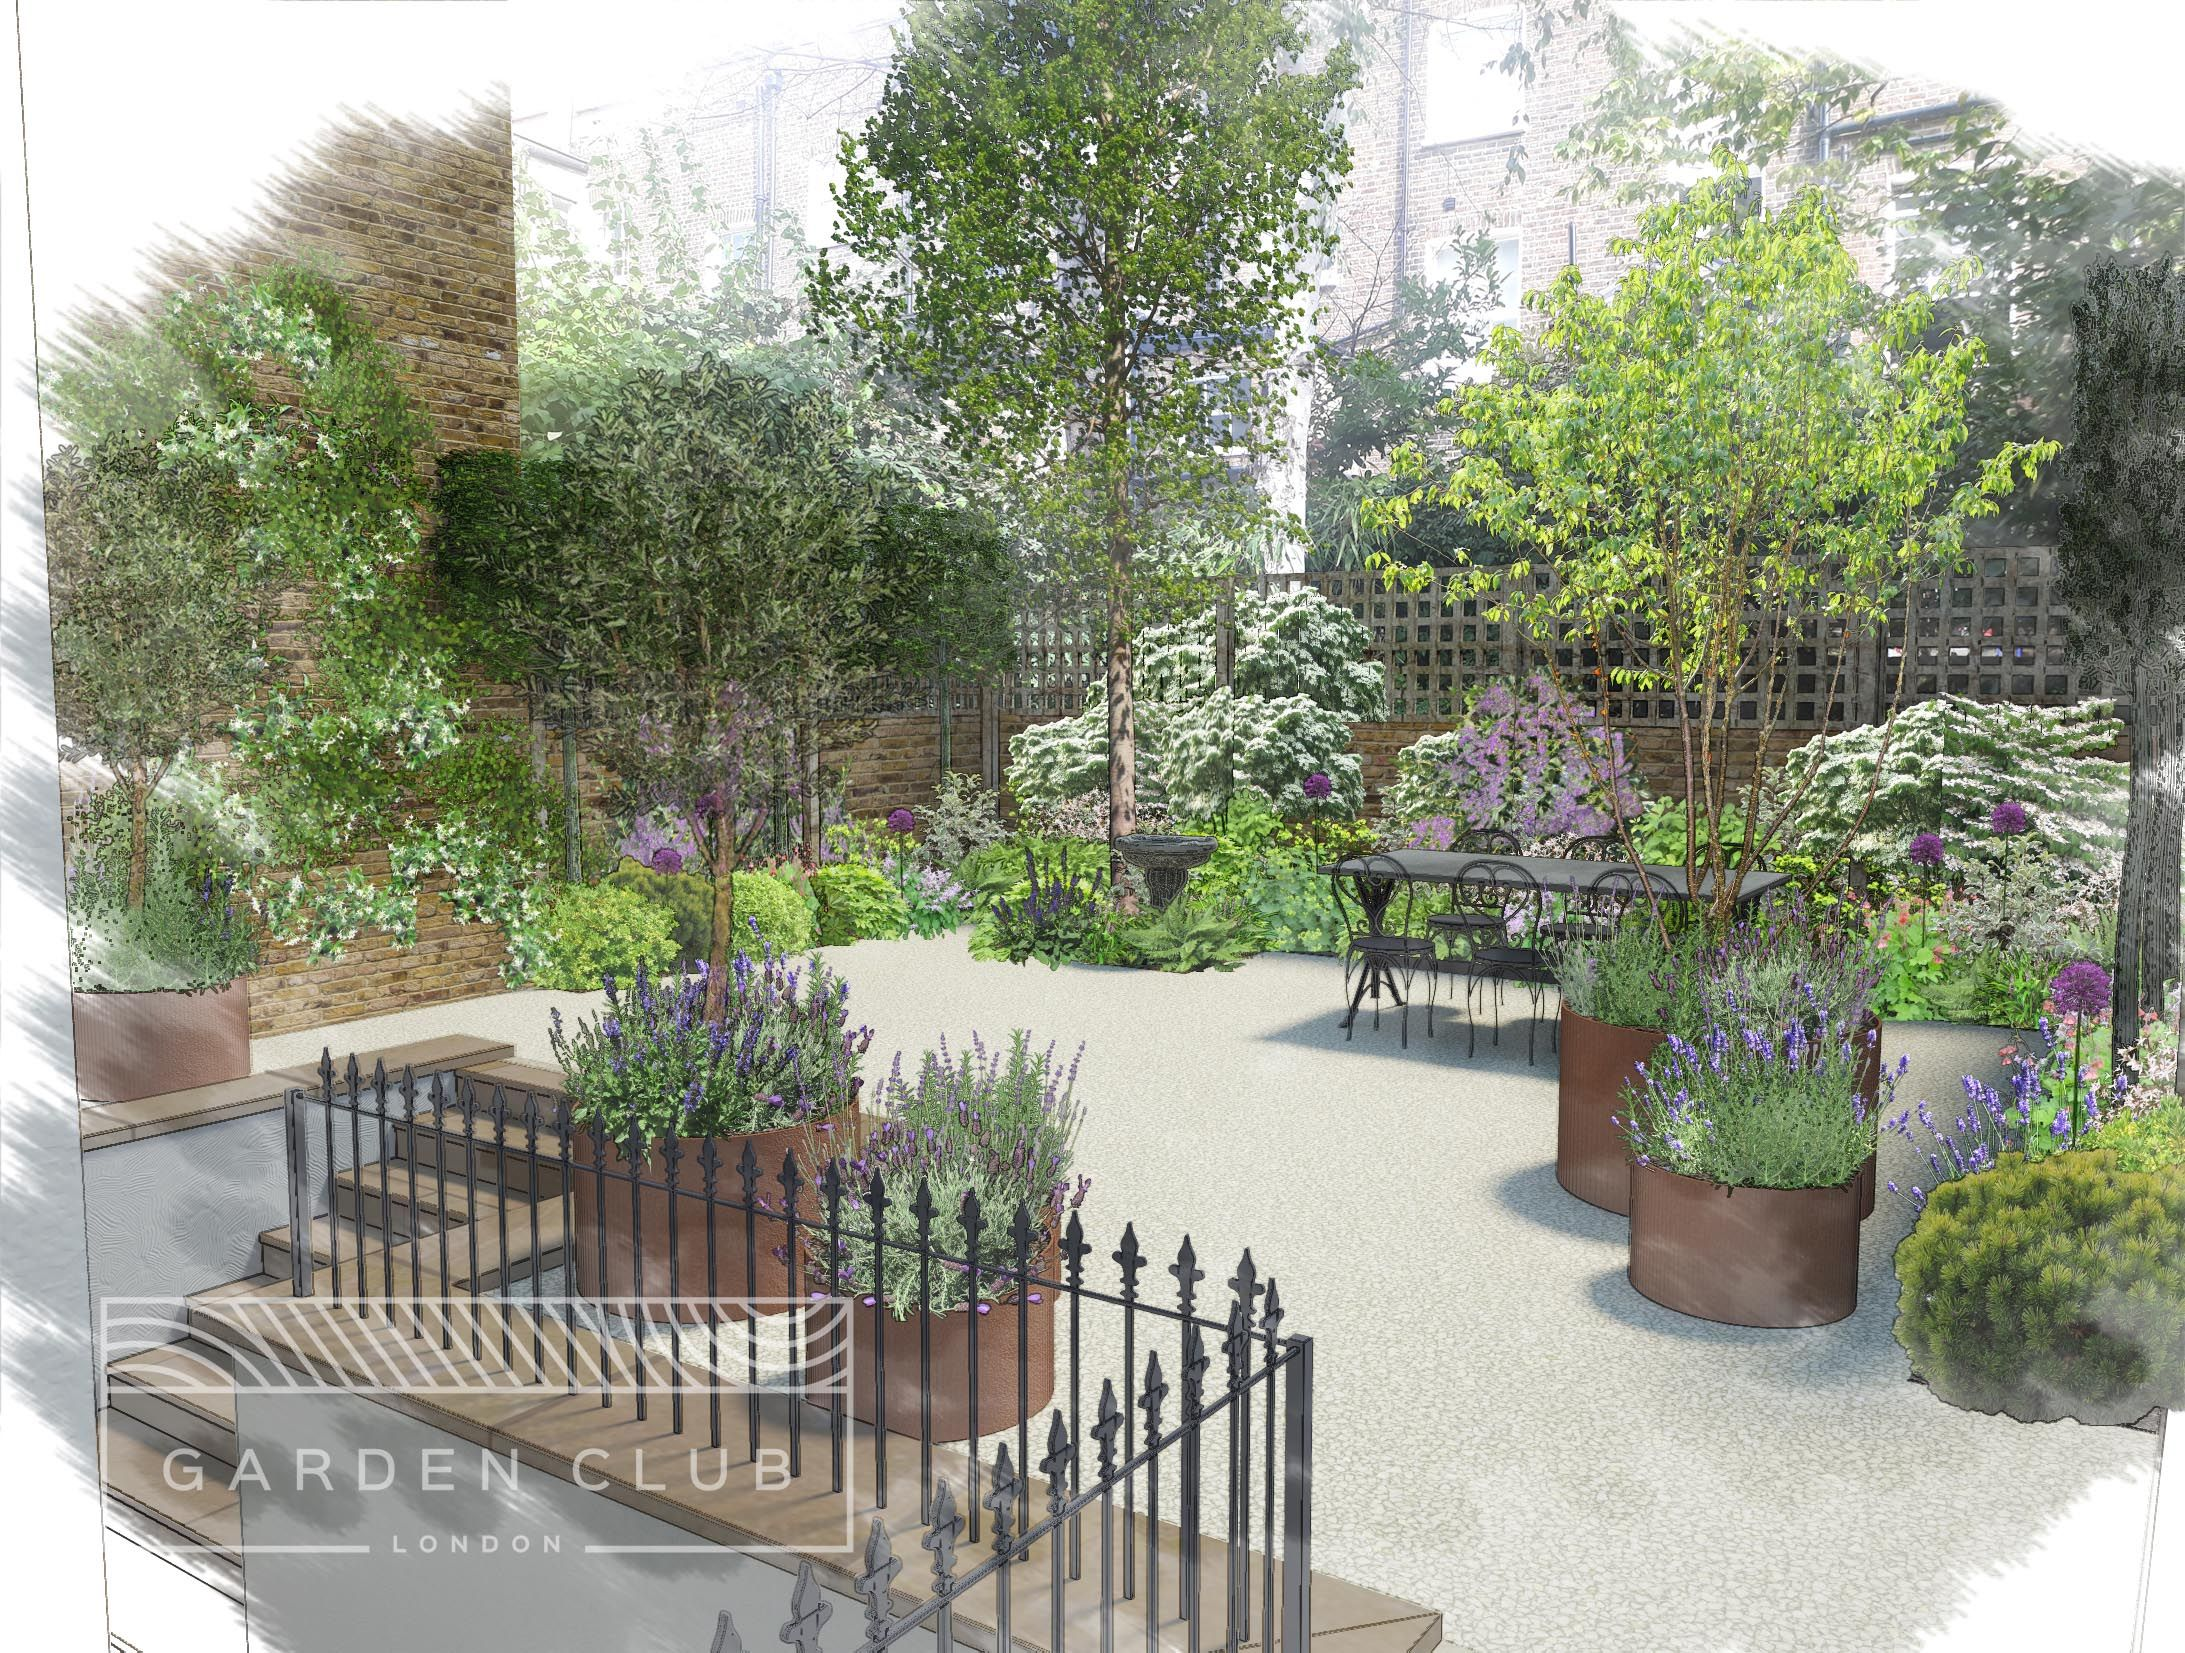 Residential garden design | Garden Club London | Rhino 3D ...